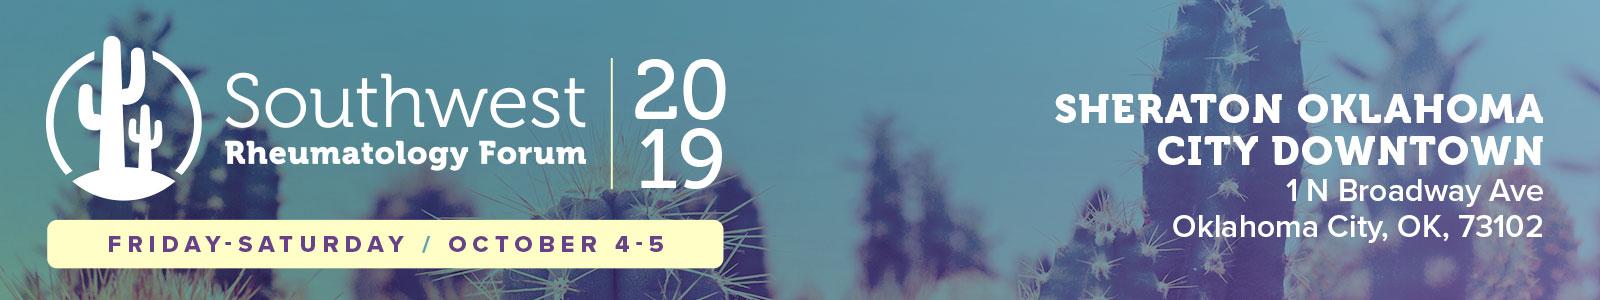 RNS Forum Series / SWRF 2019 / October 4-5